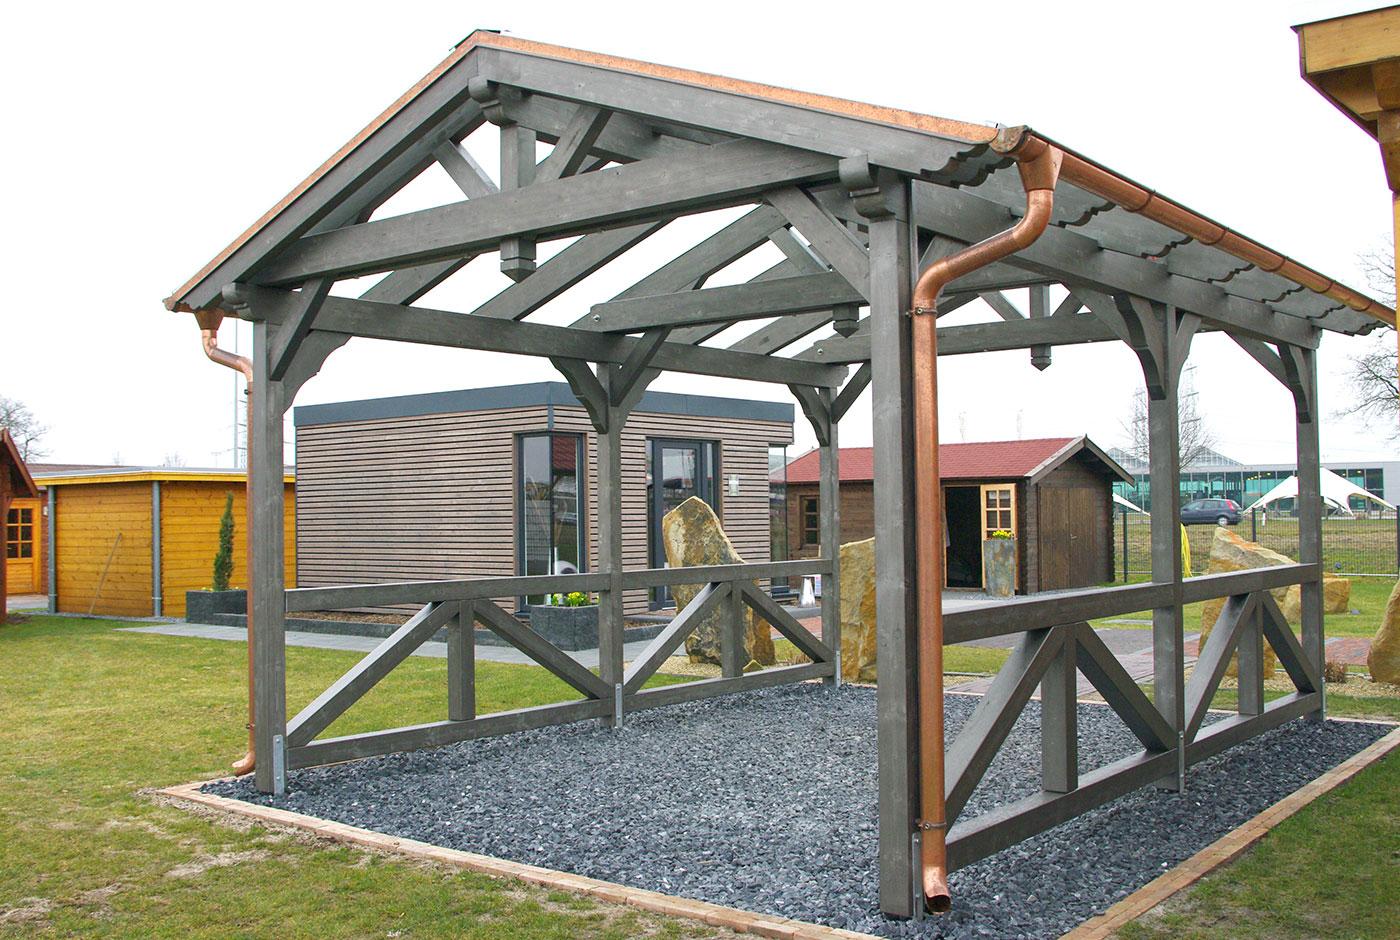 Carport Als Gartenhaus Umbauen So Muss Das